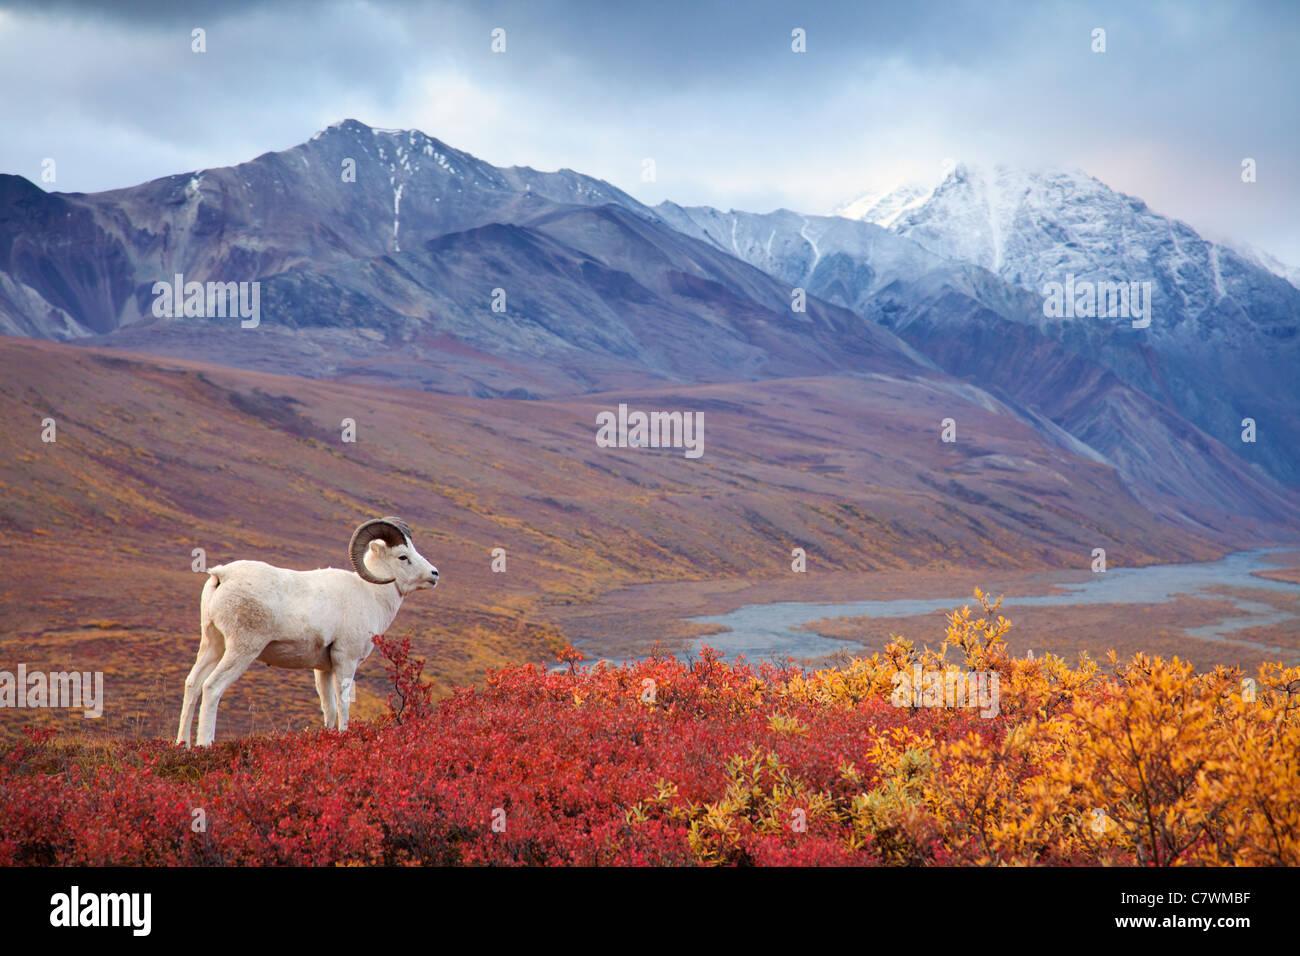 Dall's sheep in Polychrome Pass, Denali National Park, Alaska. Stock Photo